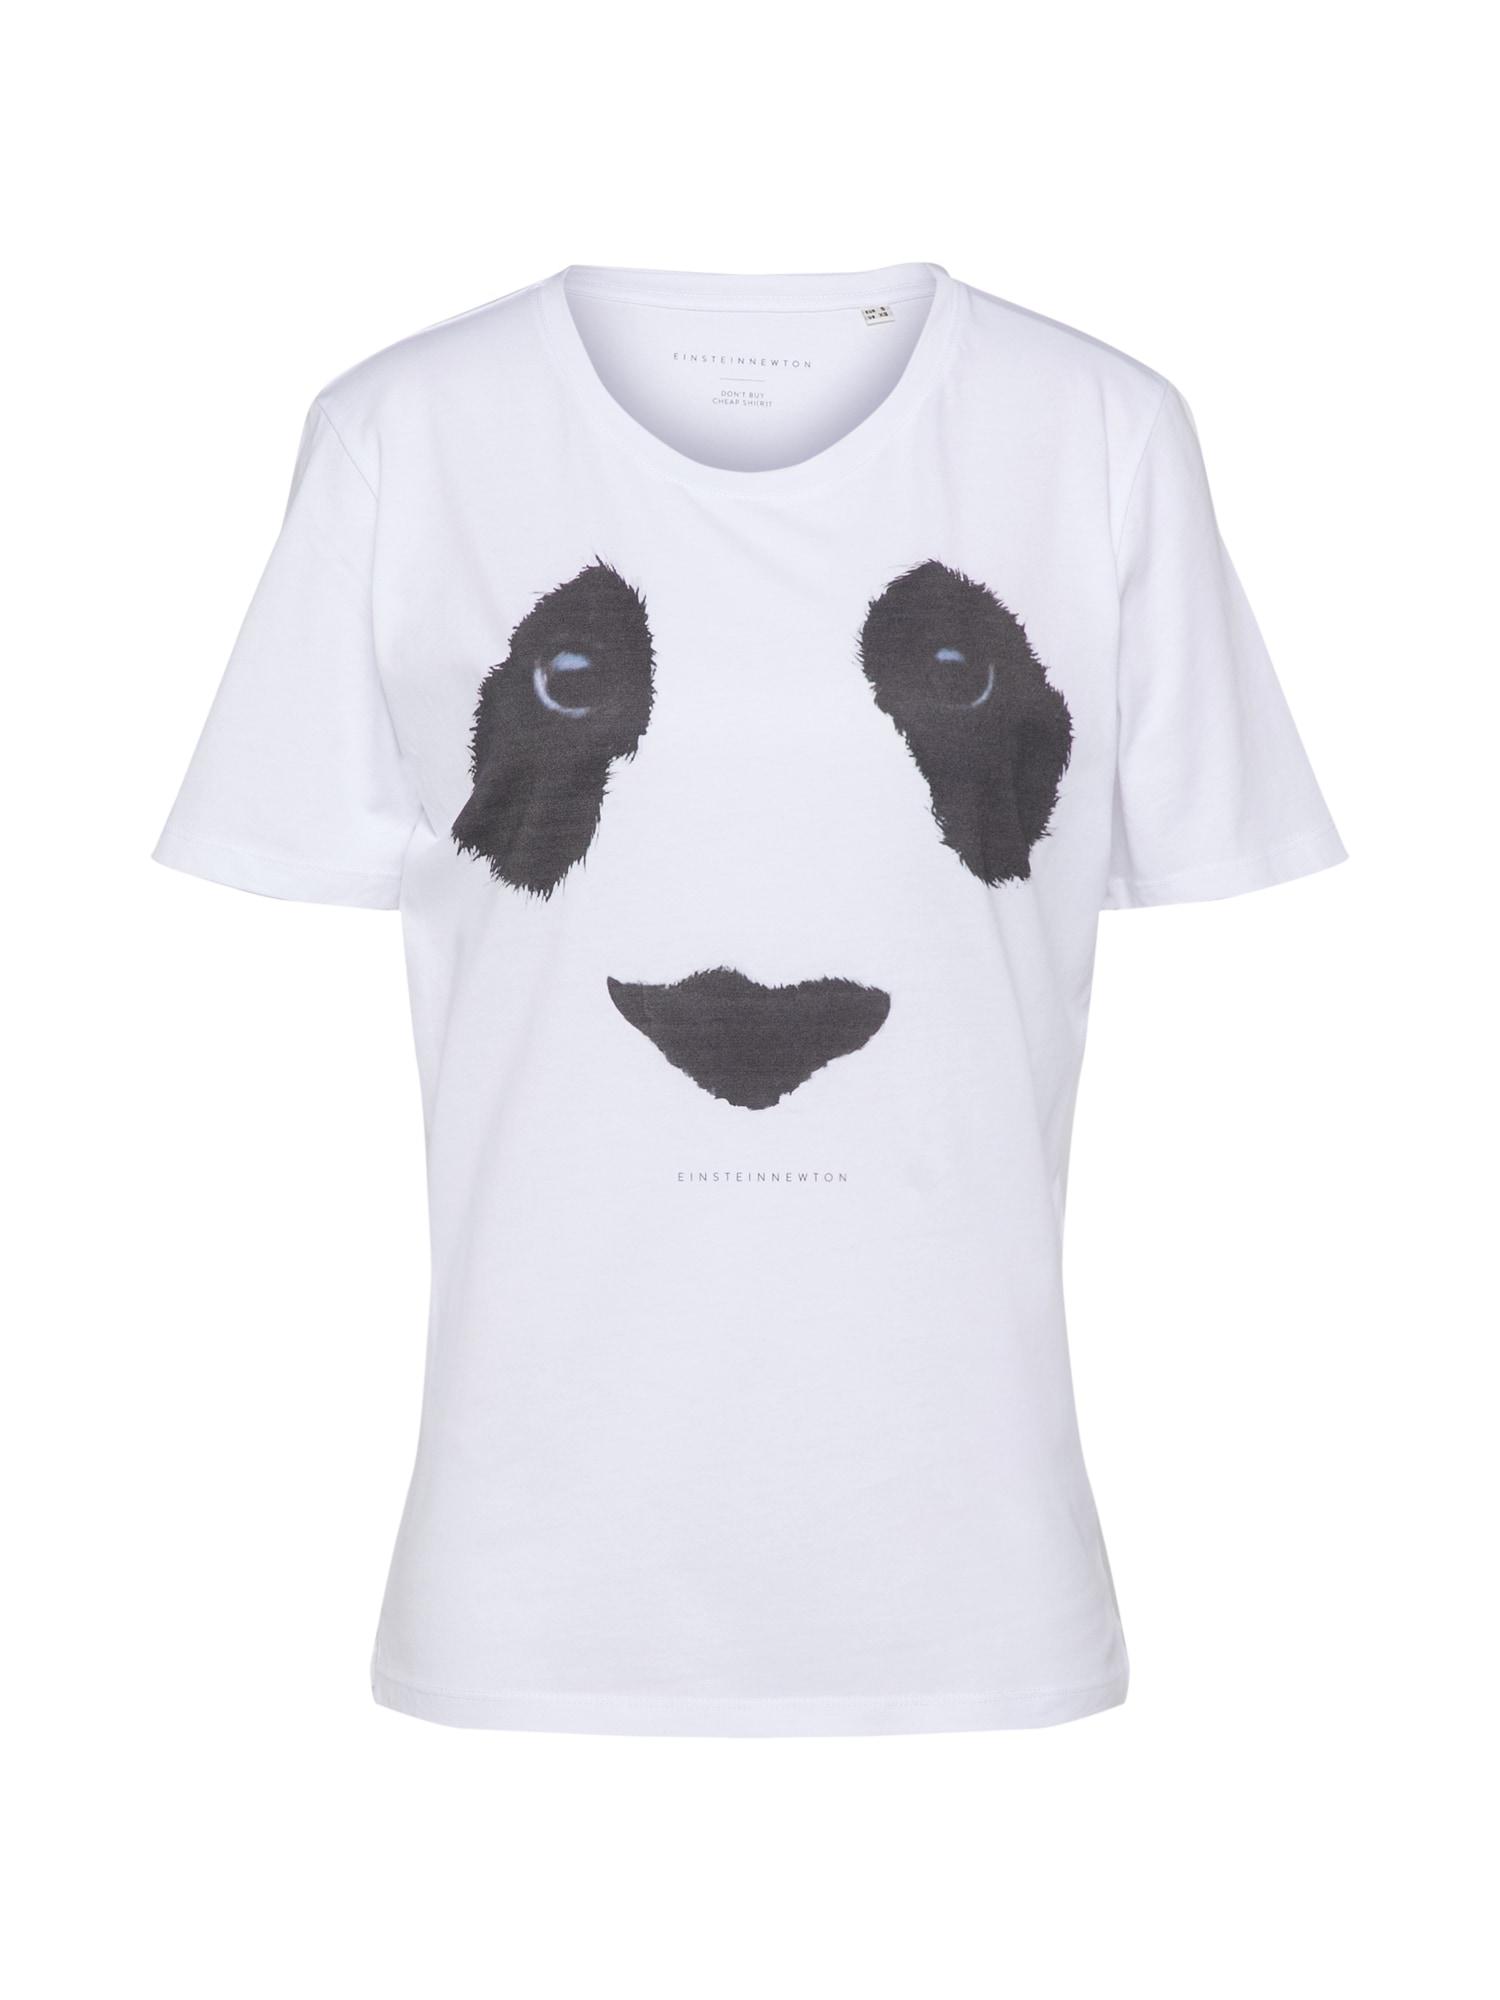 Tričko Panda Eyes Paxton tmavě šedá bílá EINSTEIN & NEWTON